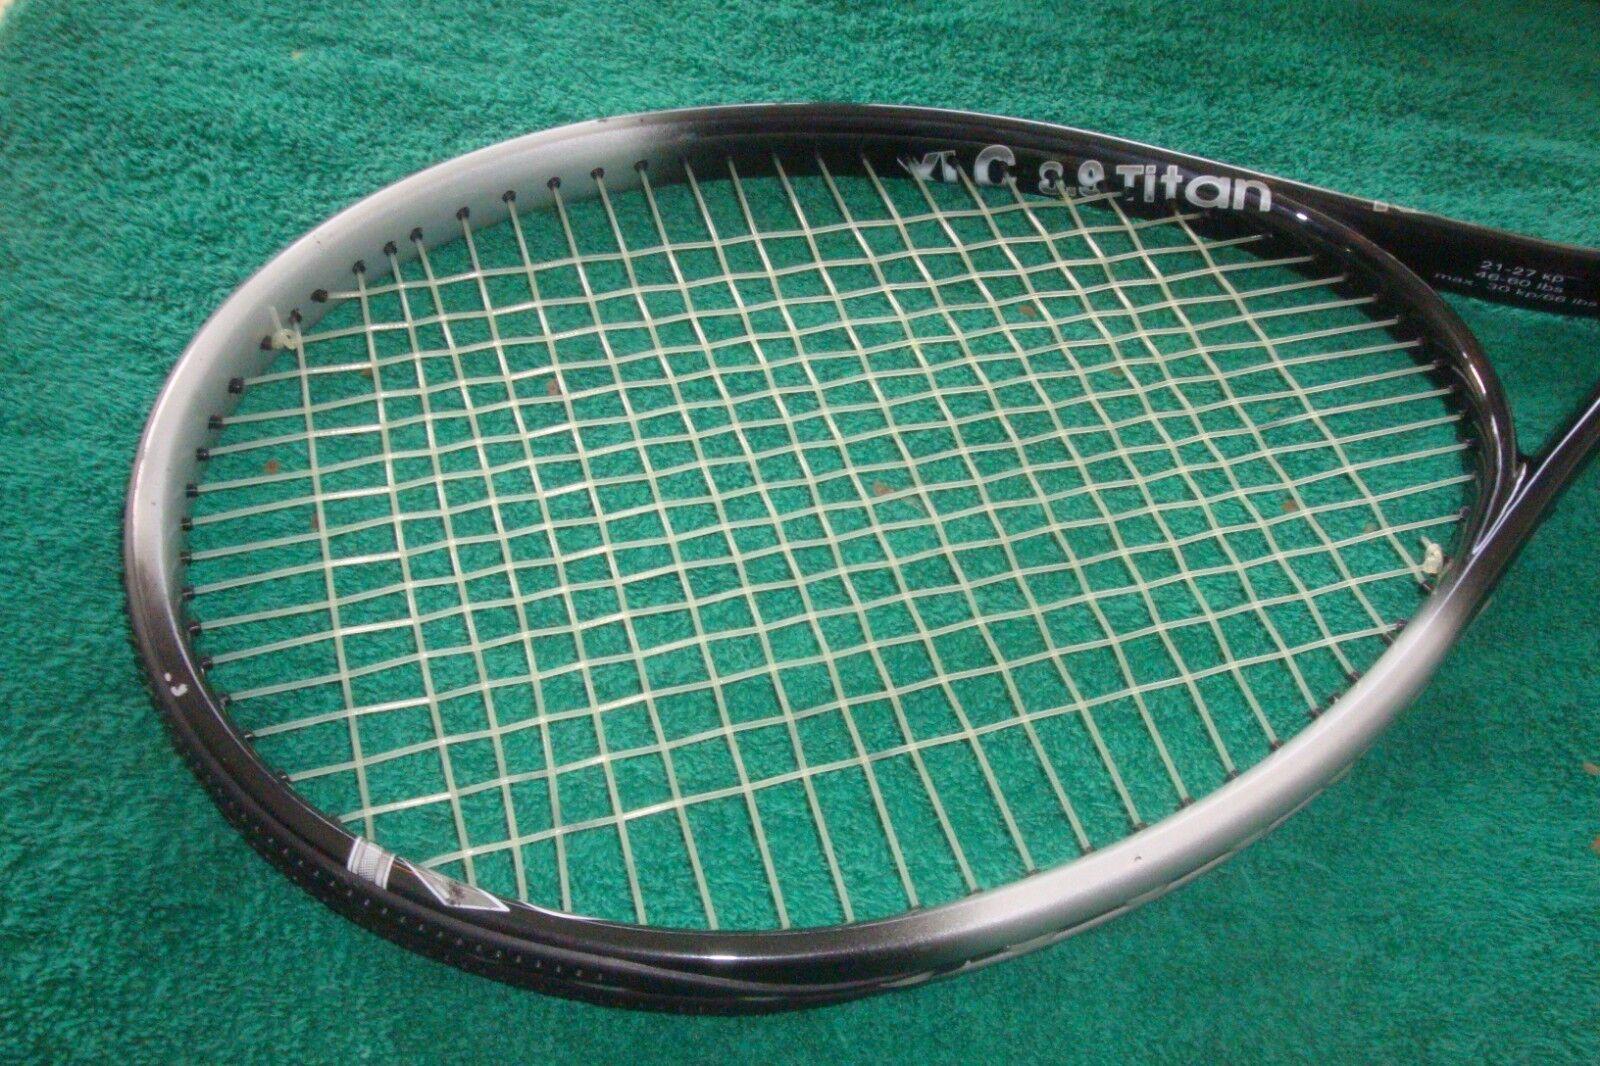 ROX XLC 8.9 Titan Tennis Racquet 4 1/4